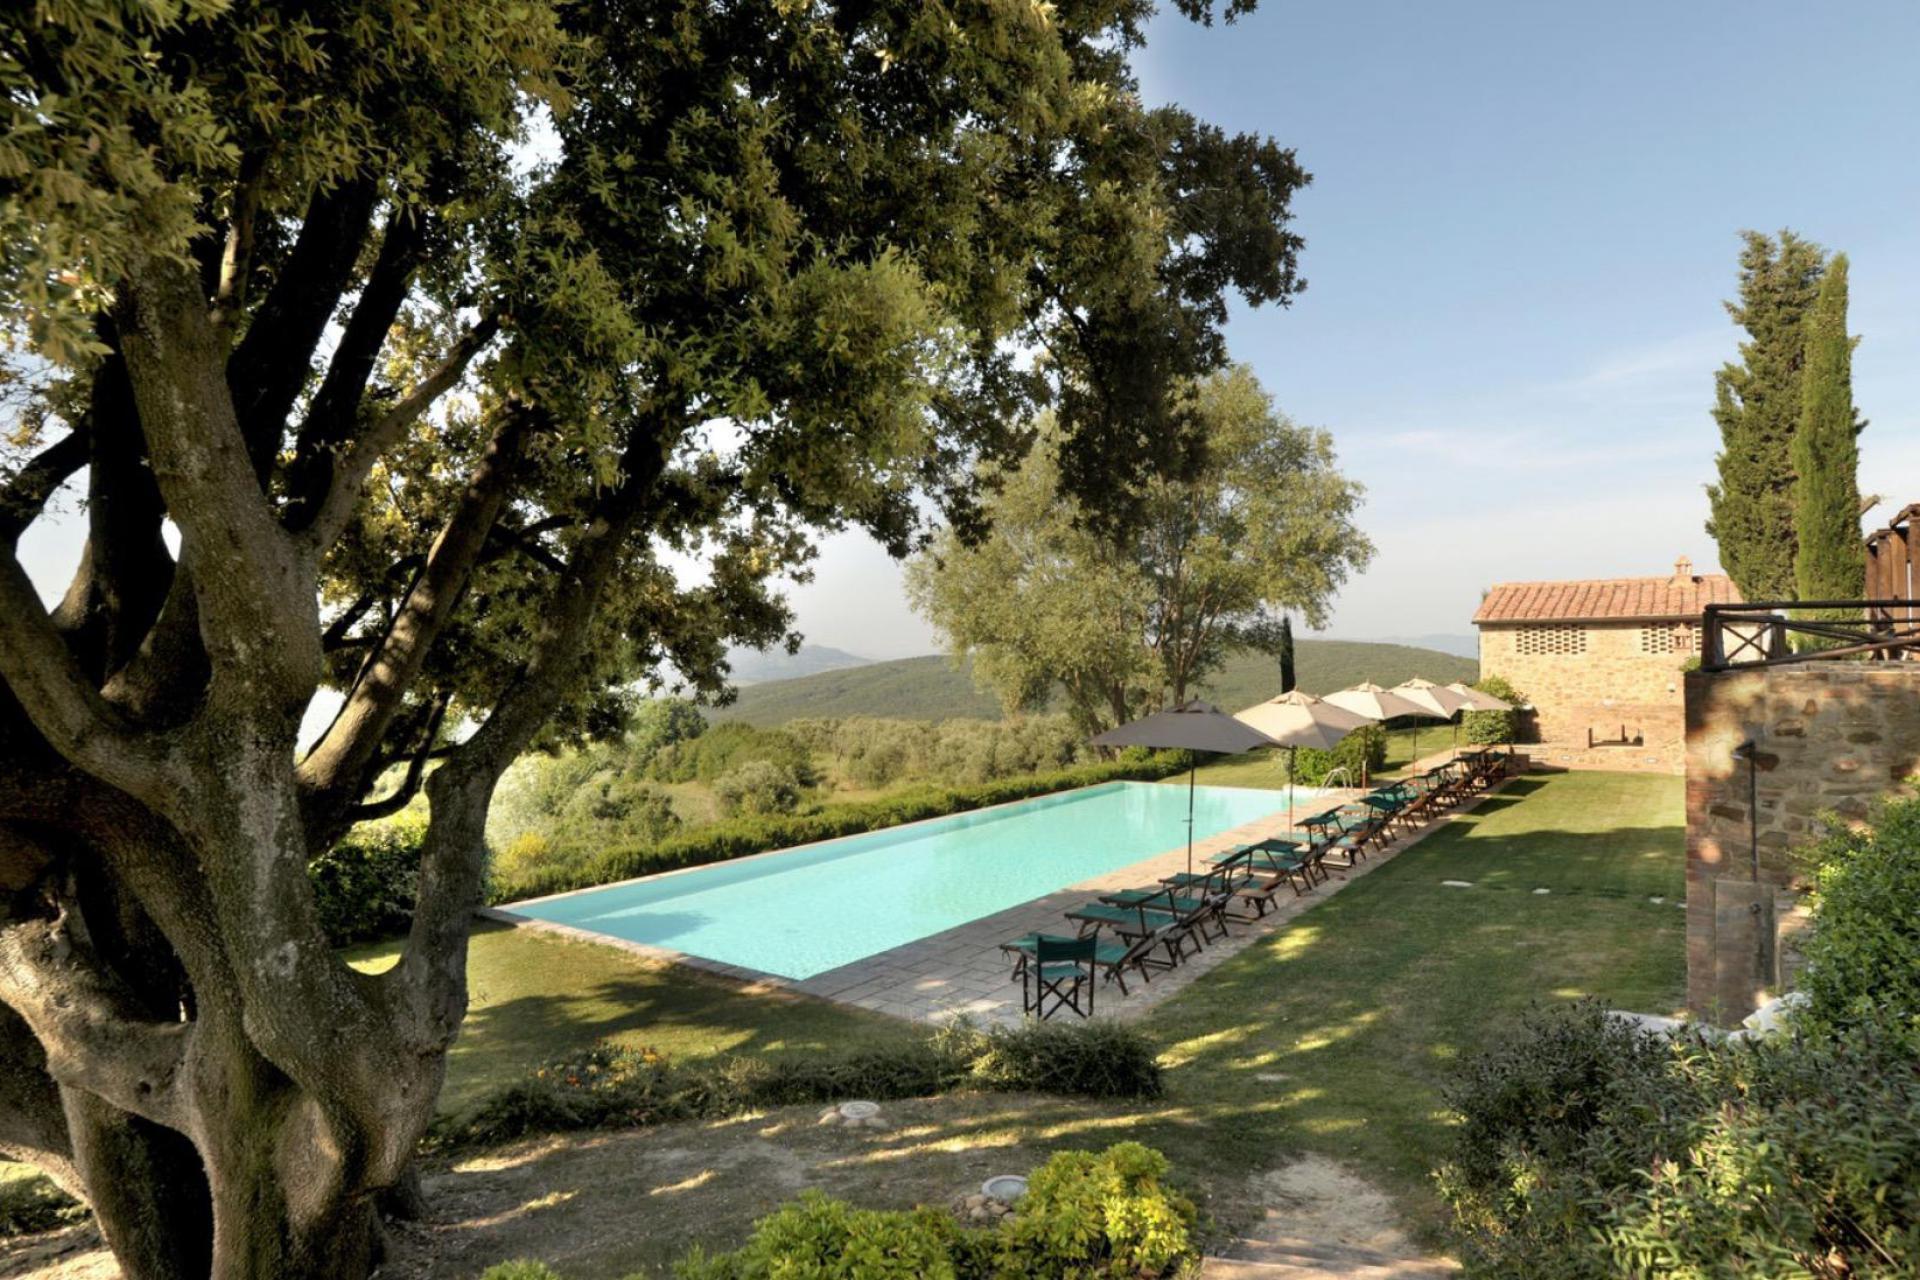 Agriturismo Toscane Zeer gastvrije accommodatie nabij San Gimignano | myitaly.nl